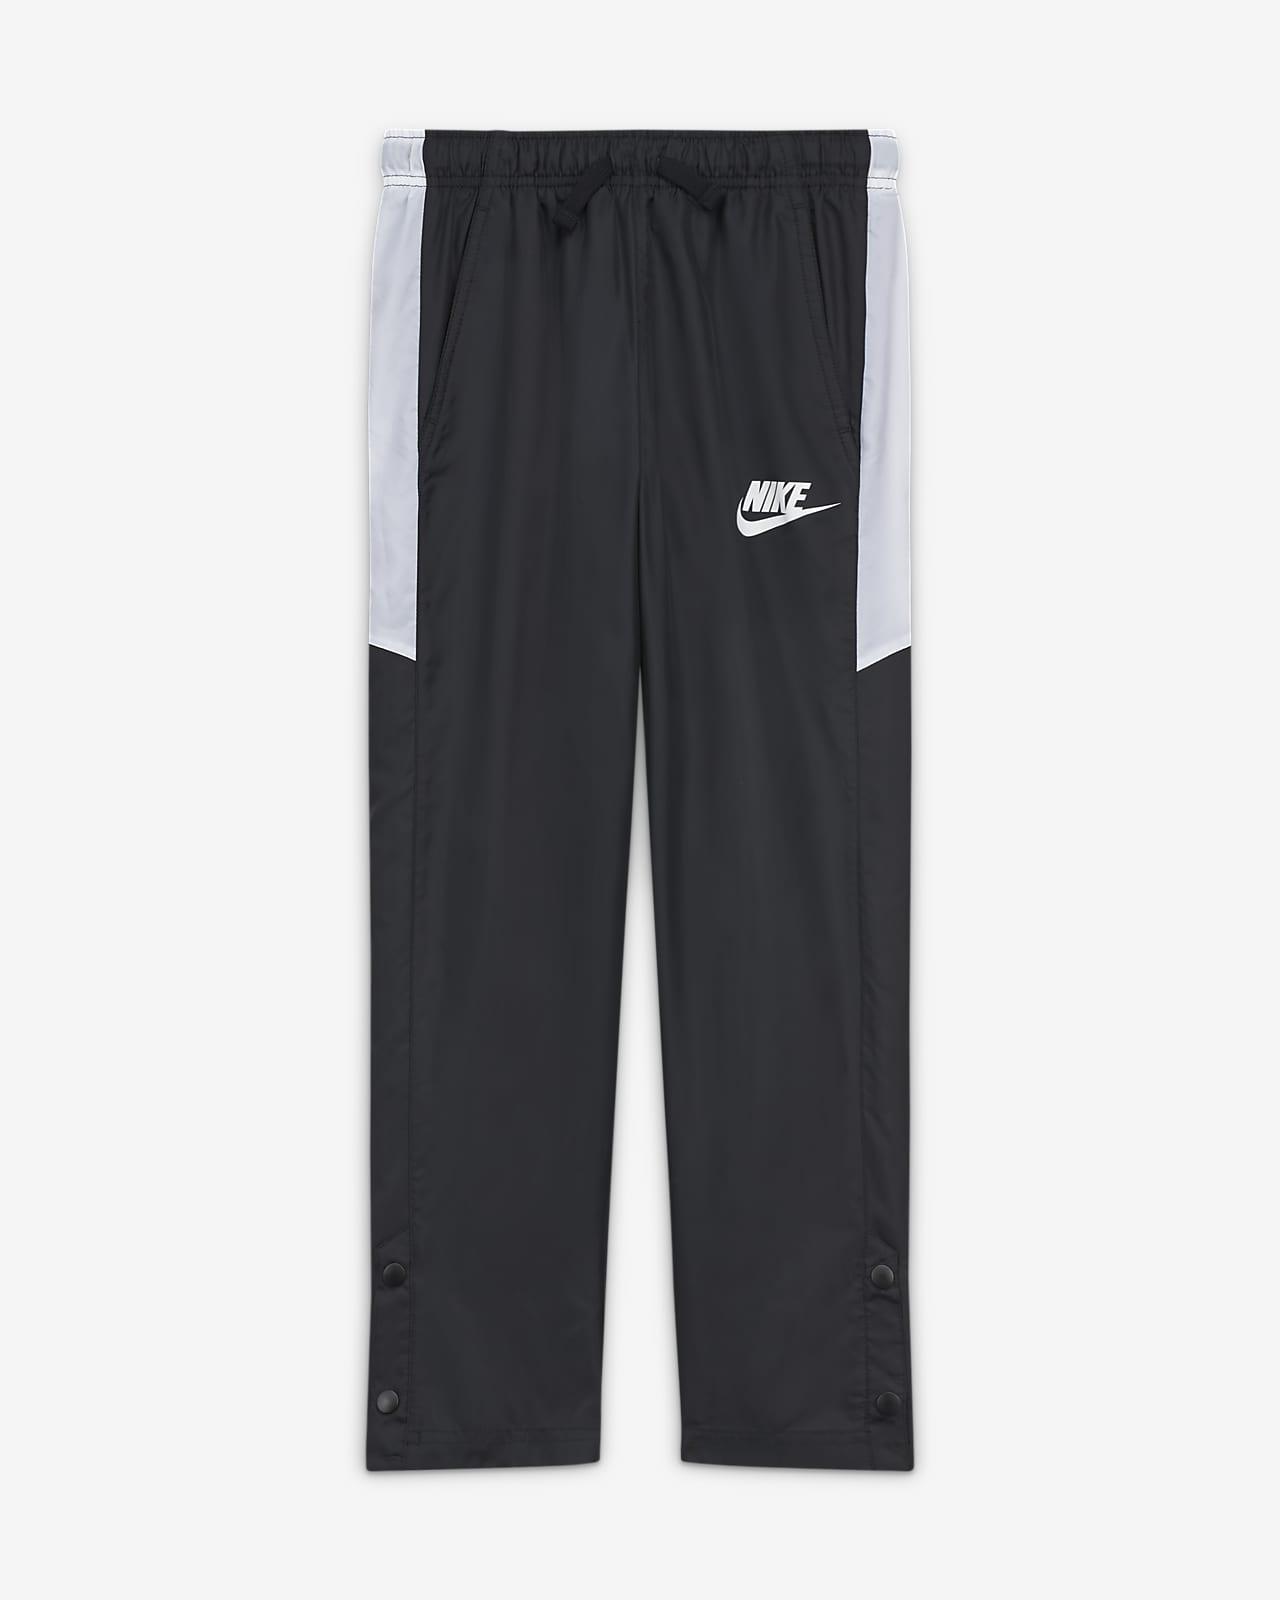 Pantalones de tejido woven para niños talla grande Nike Sportswear